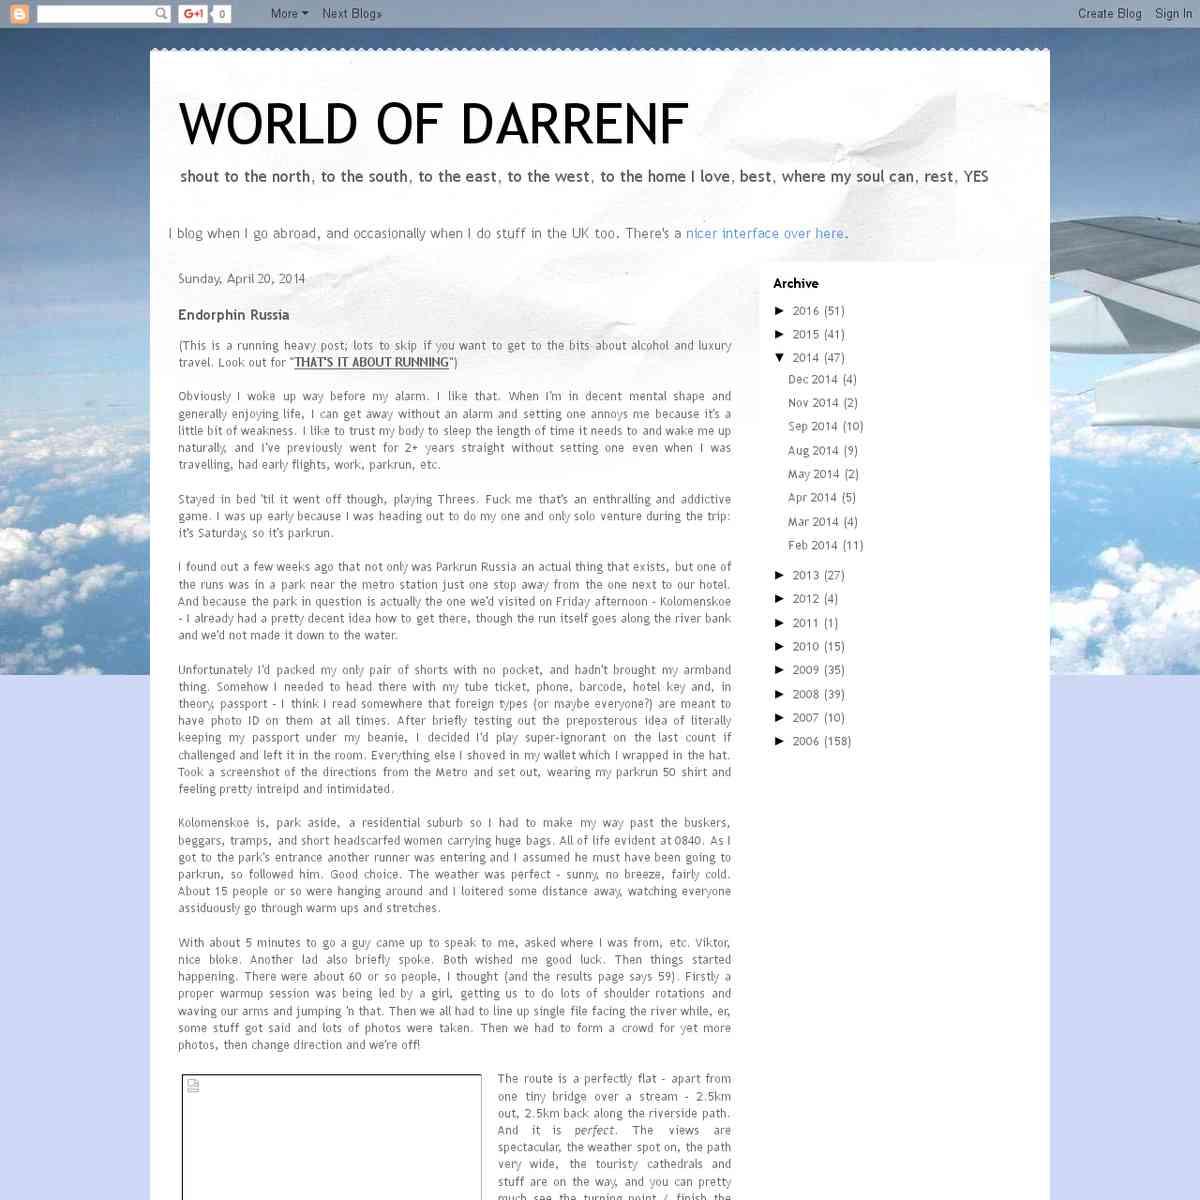 blog.darrenf.org/2014/04/endorphin-russia.html